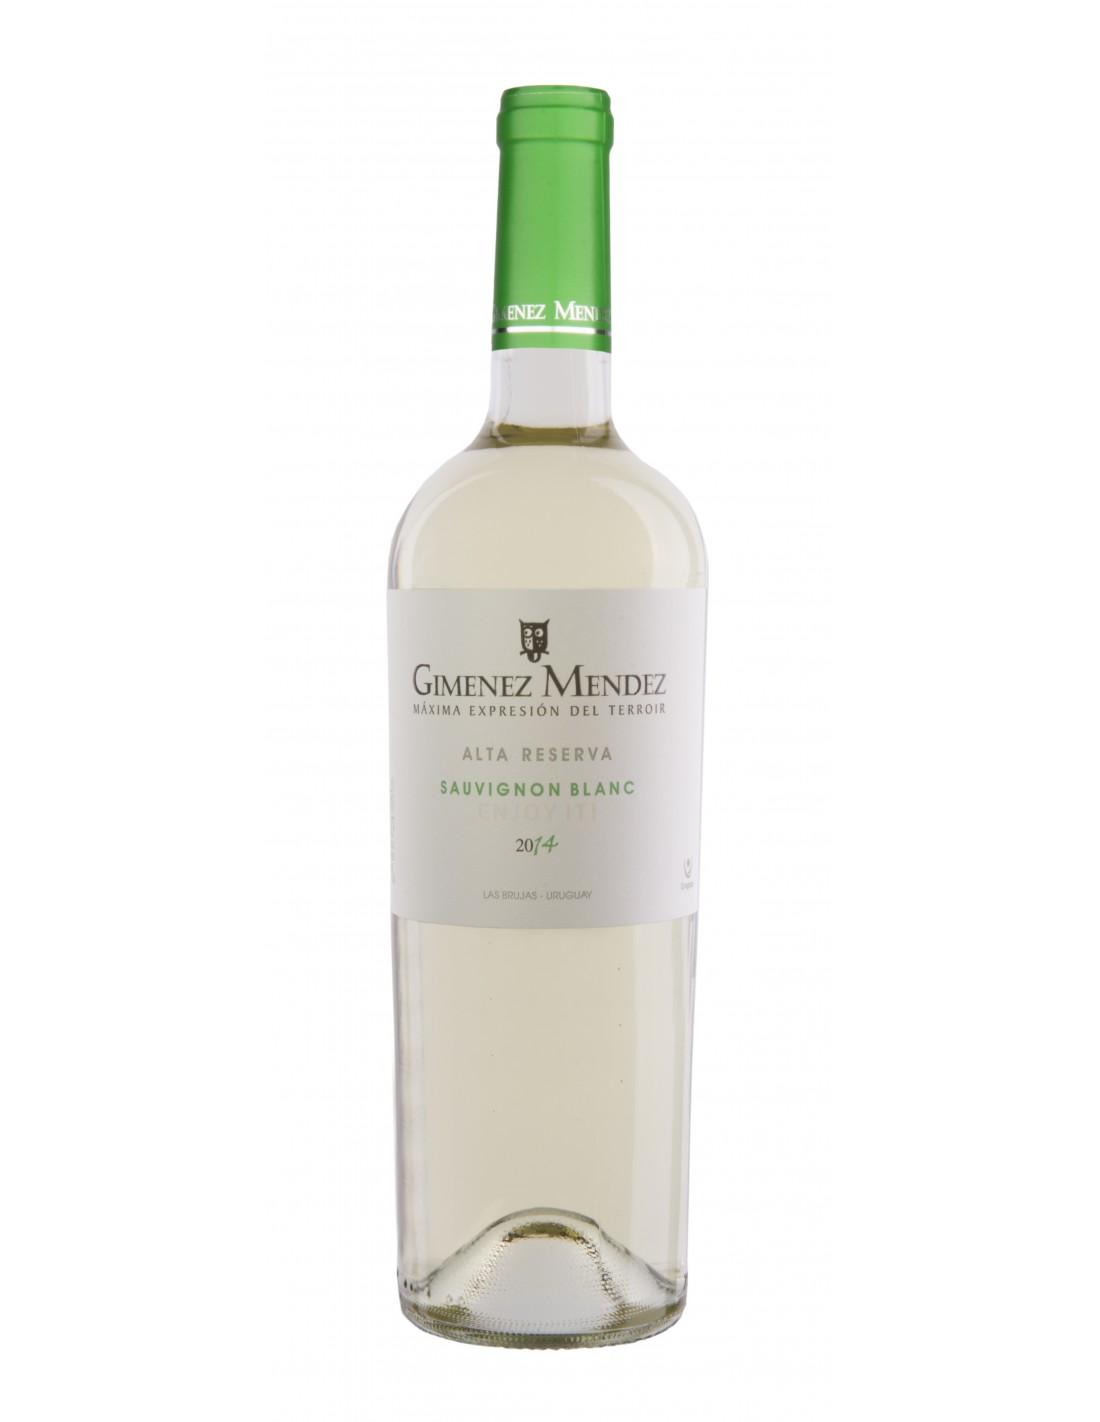 Vin alb, Sauvignon Blanc, Gimenez Mendez Alta Reserva, 0.75L, 12% alc., Uruguay